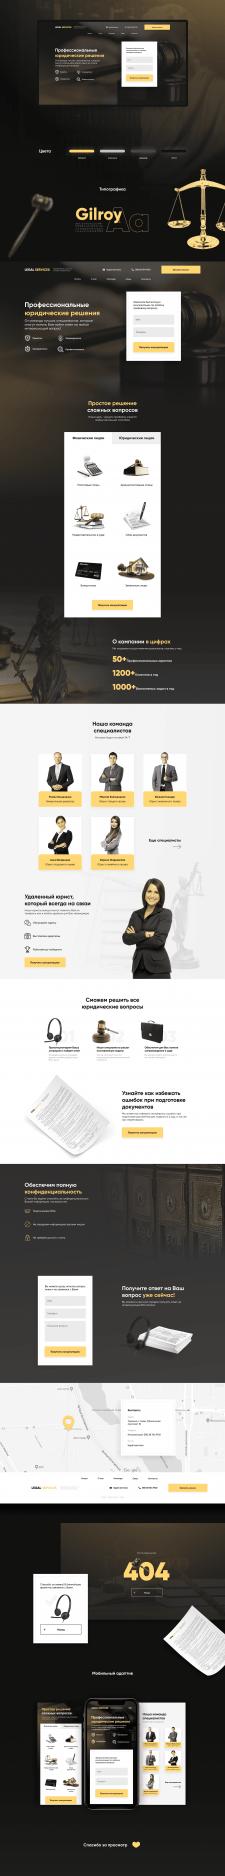 Legal Services - Landing page